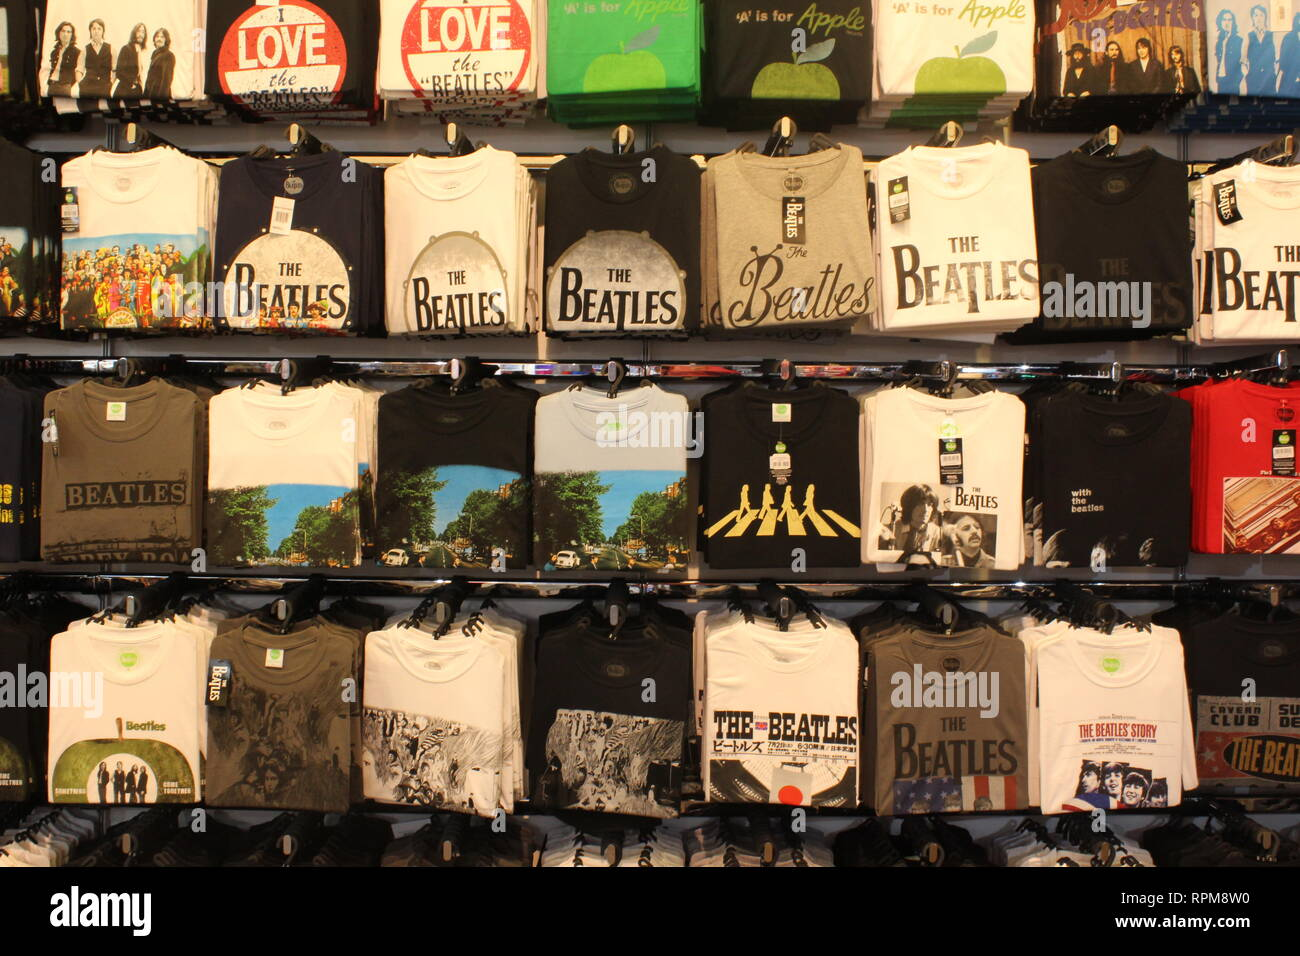 Beatles tee shirts taken in Liverpool - Stock Image